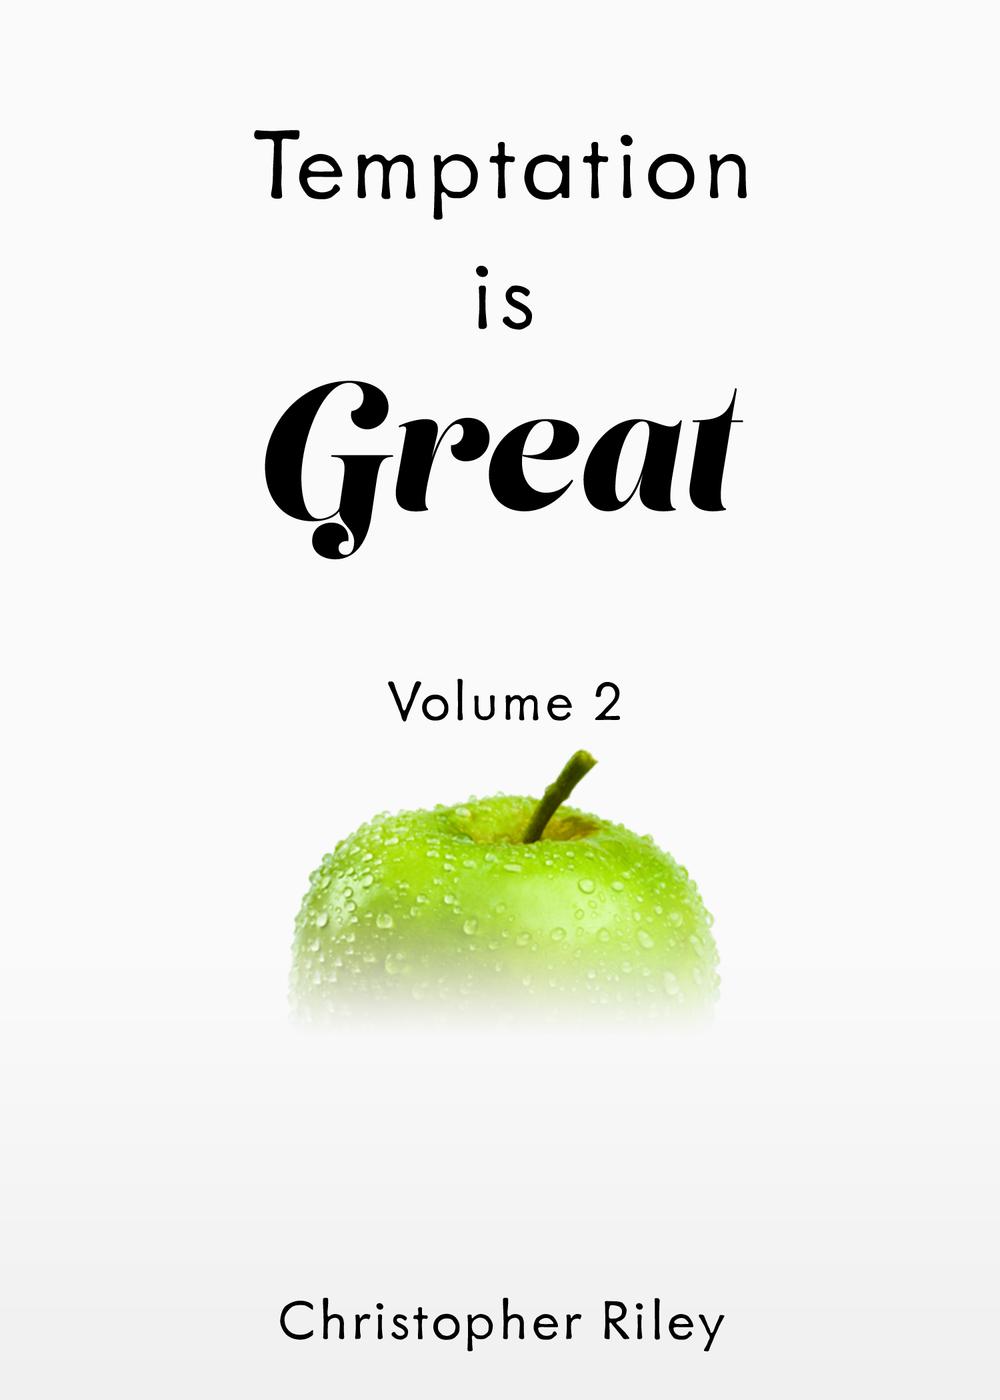 Temptation is Great: Volume 2